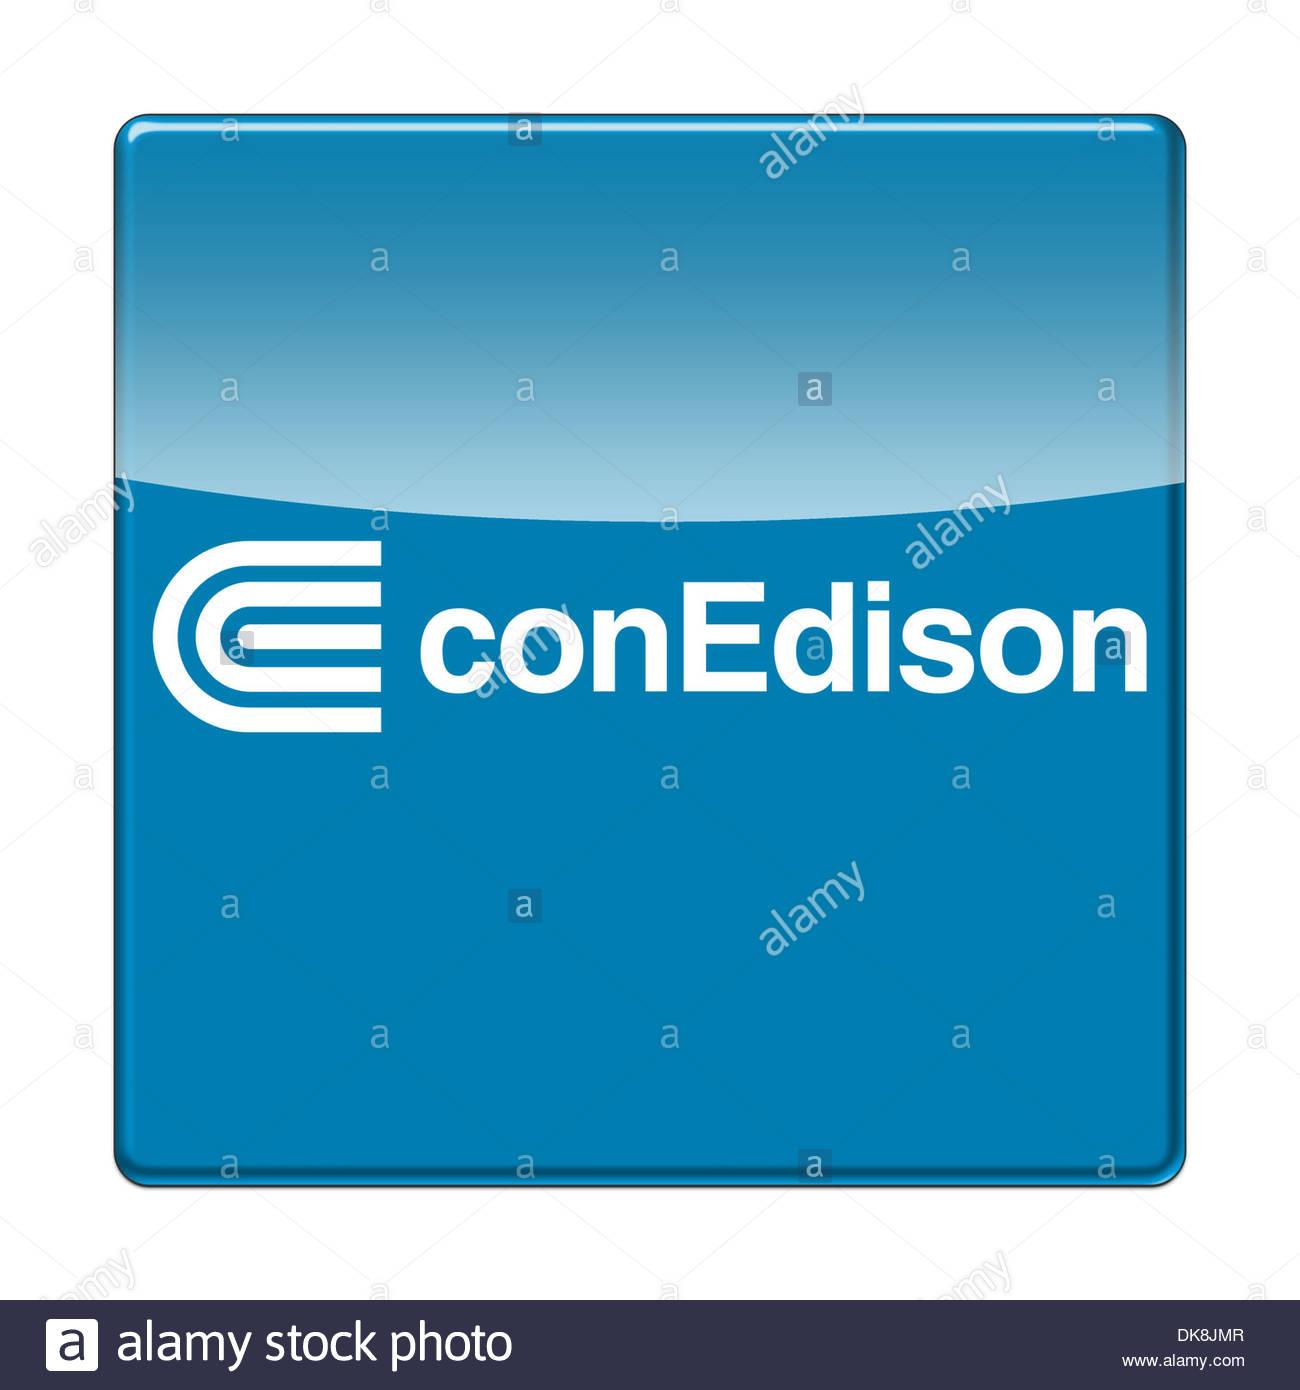 Consolidated Edison app icon logo flag - Stock Image